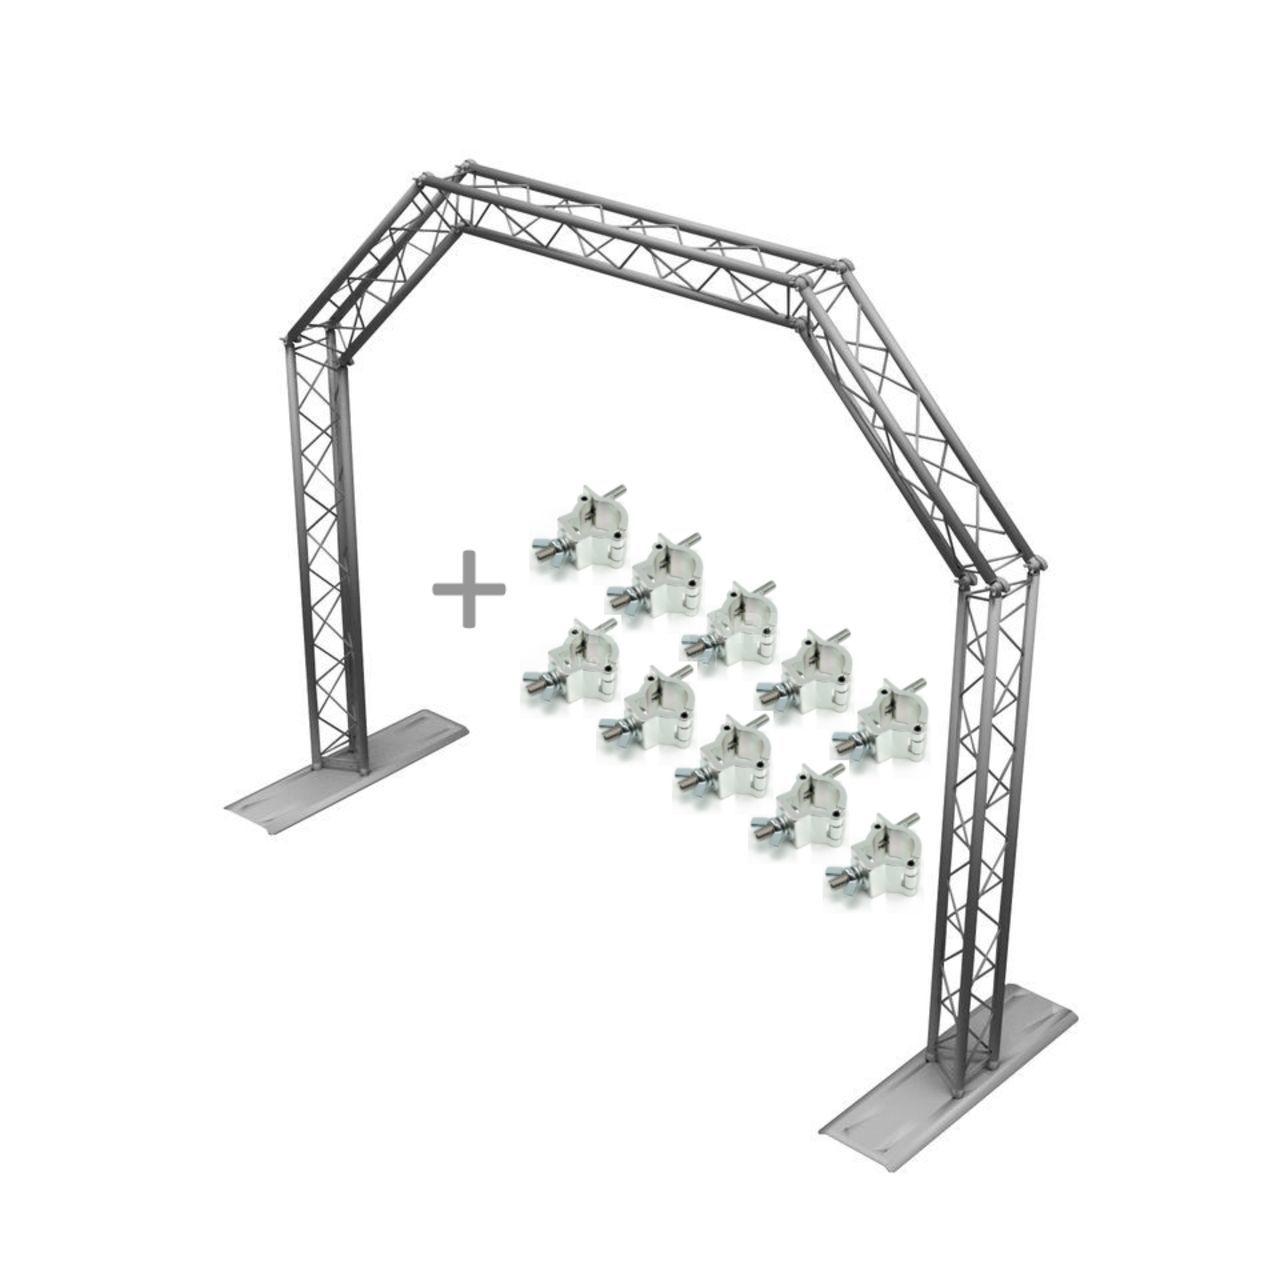 Lightmaxx Mobile Dj Truss Gate